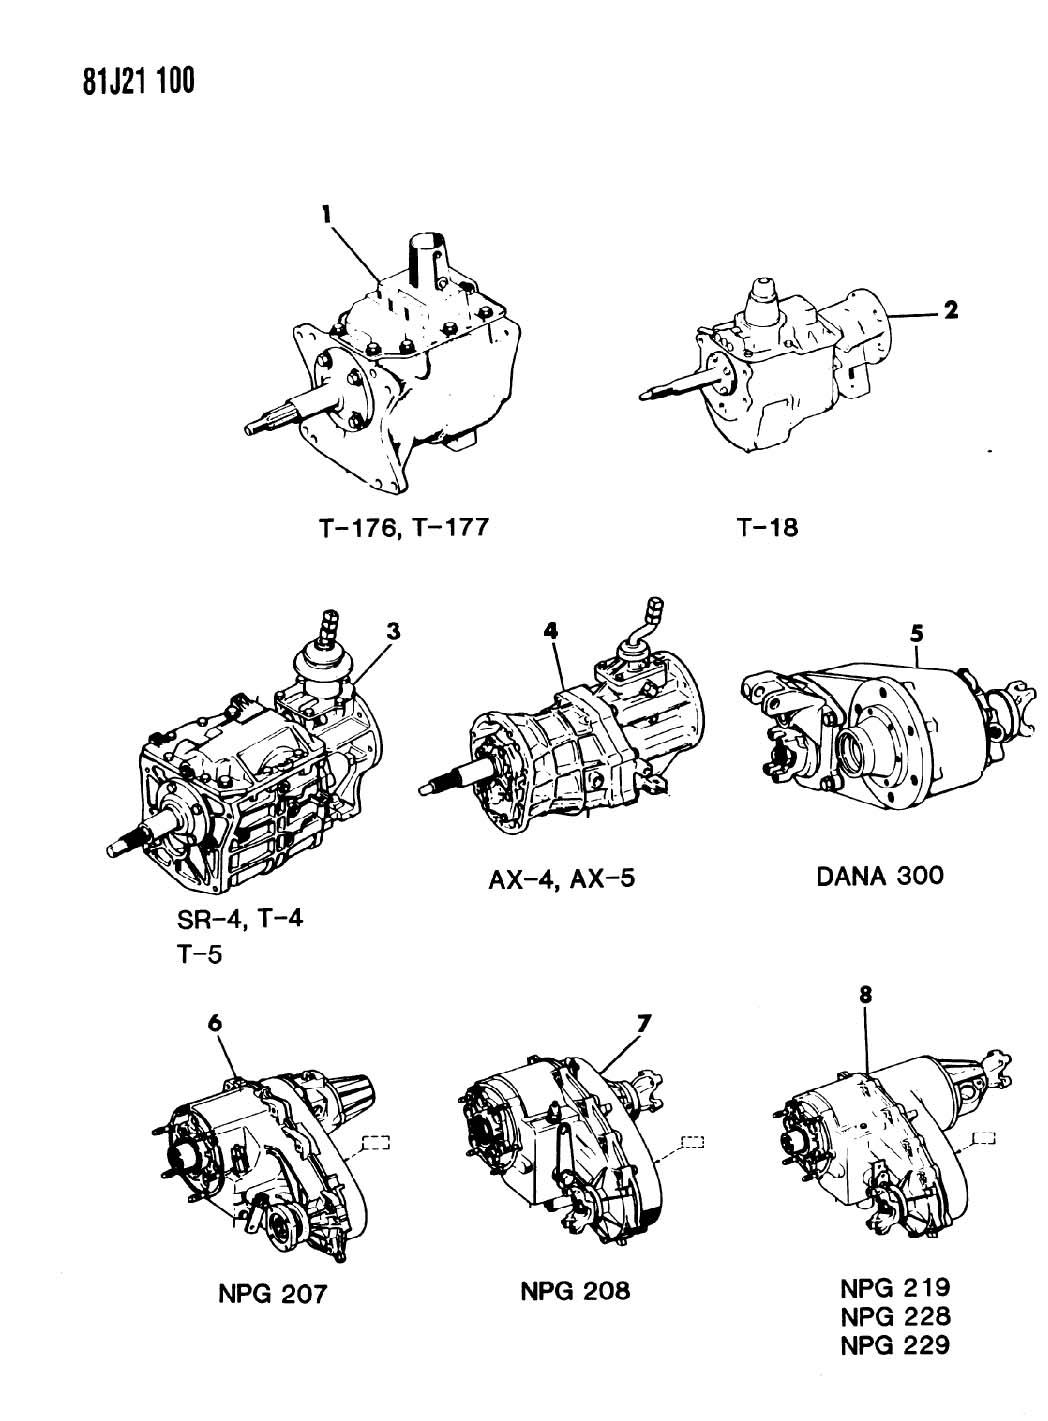 Jeep Wrangler Transfer Case Assembly  Dana Model 300  1981